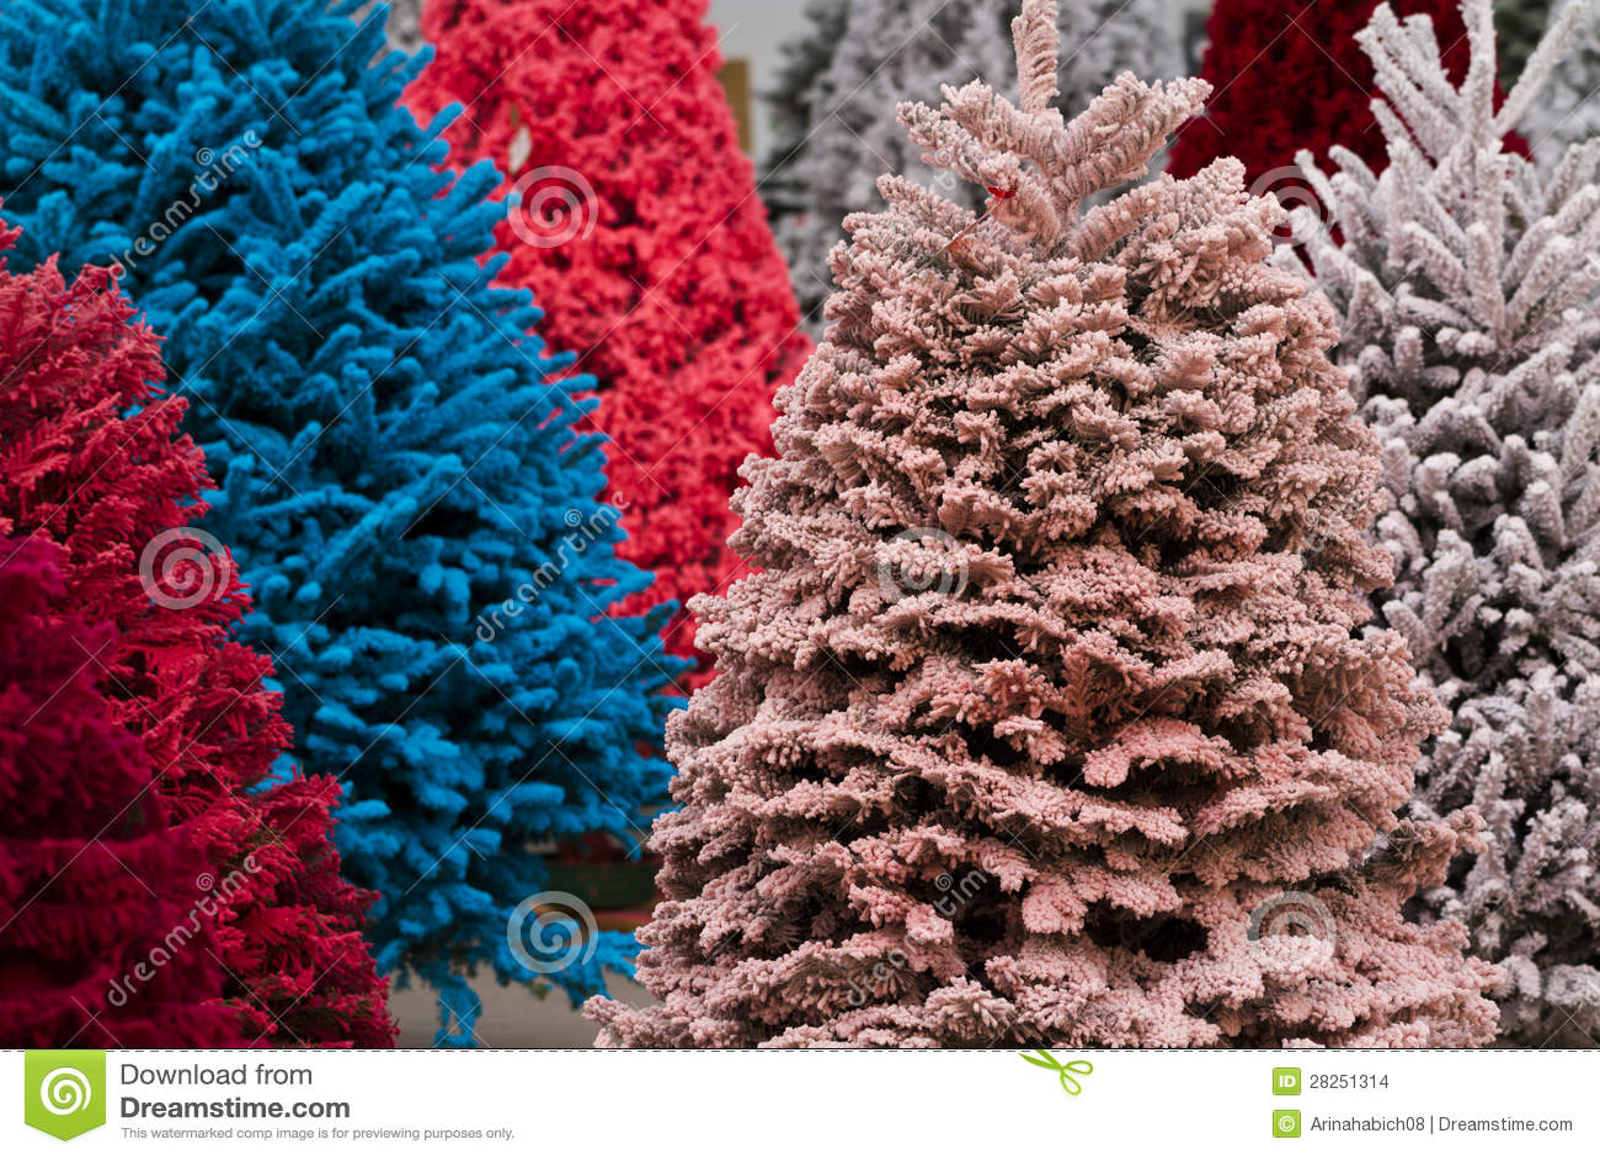 Flocked Christmas Tree Stock Images Image 28251314